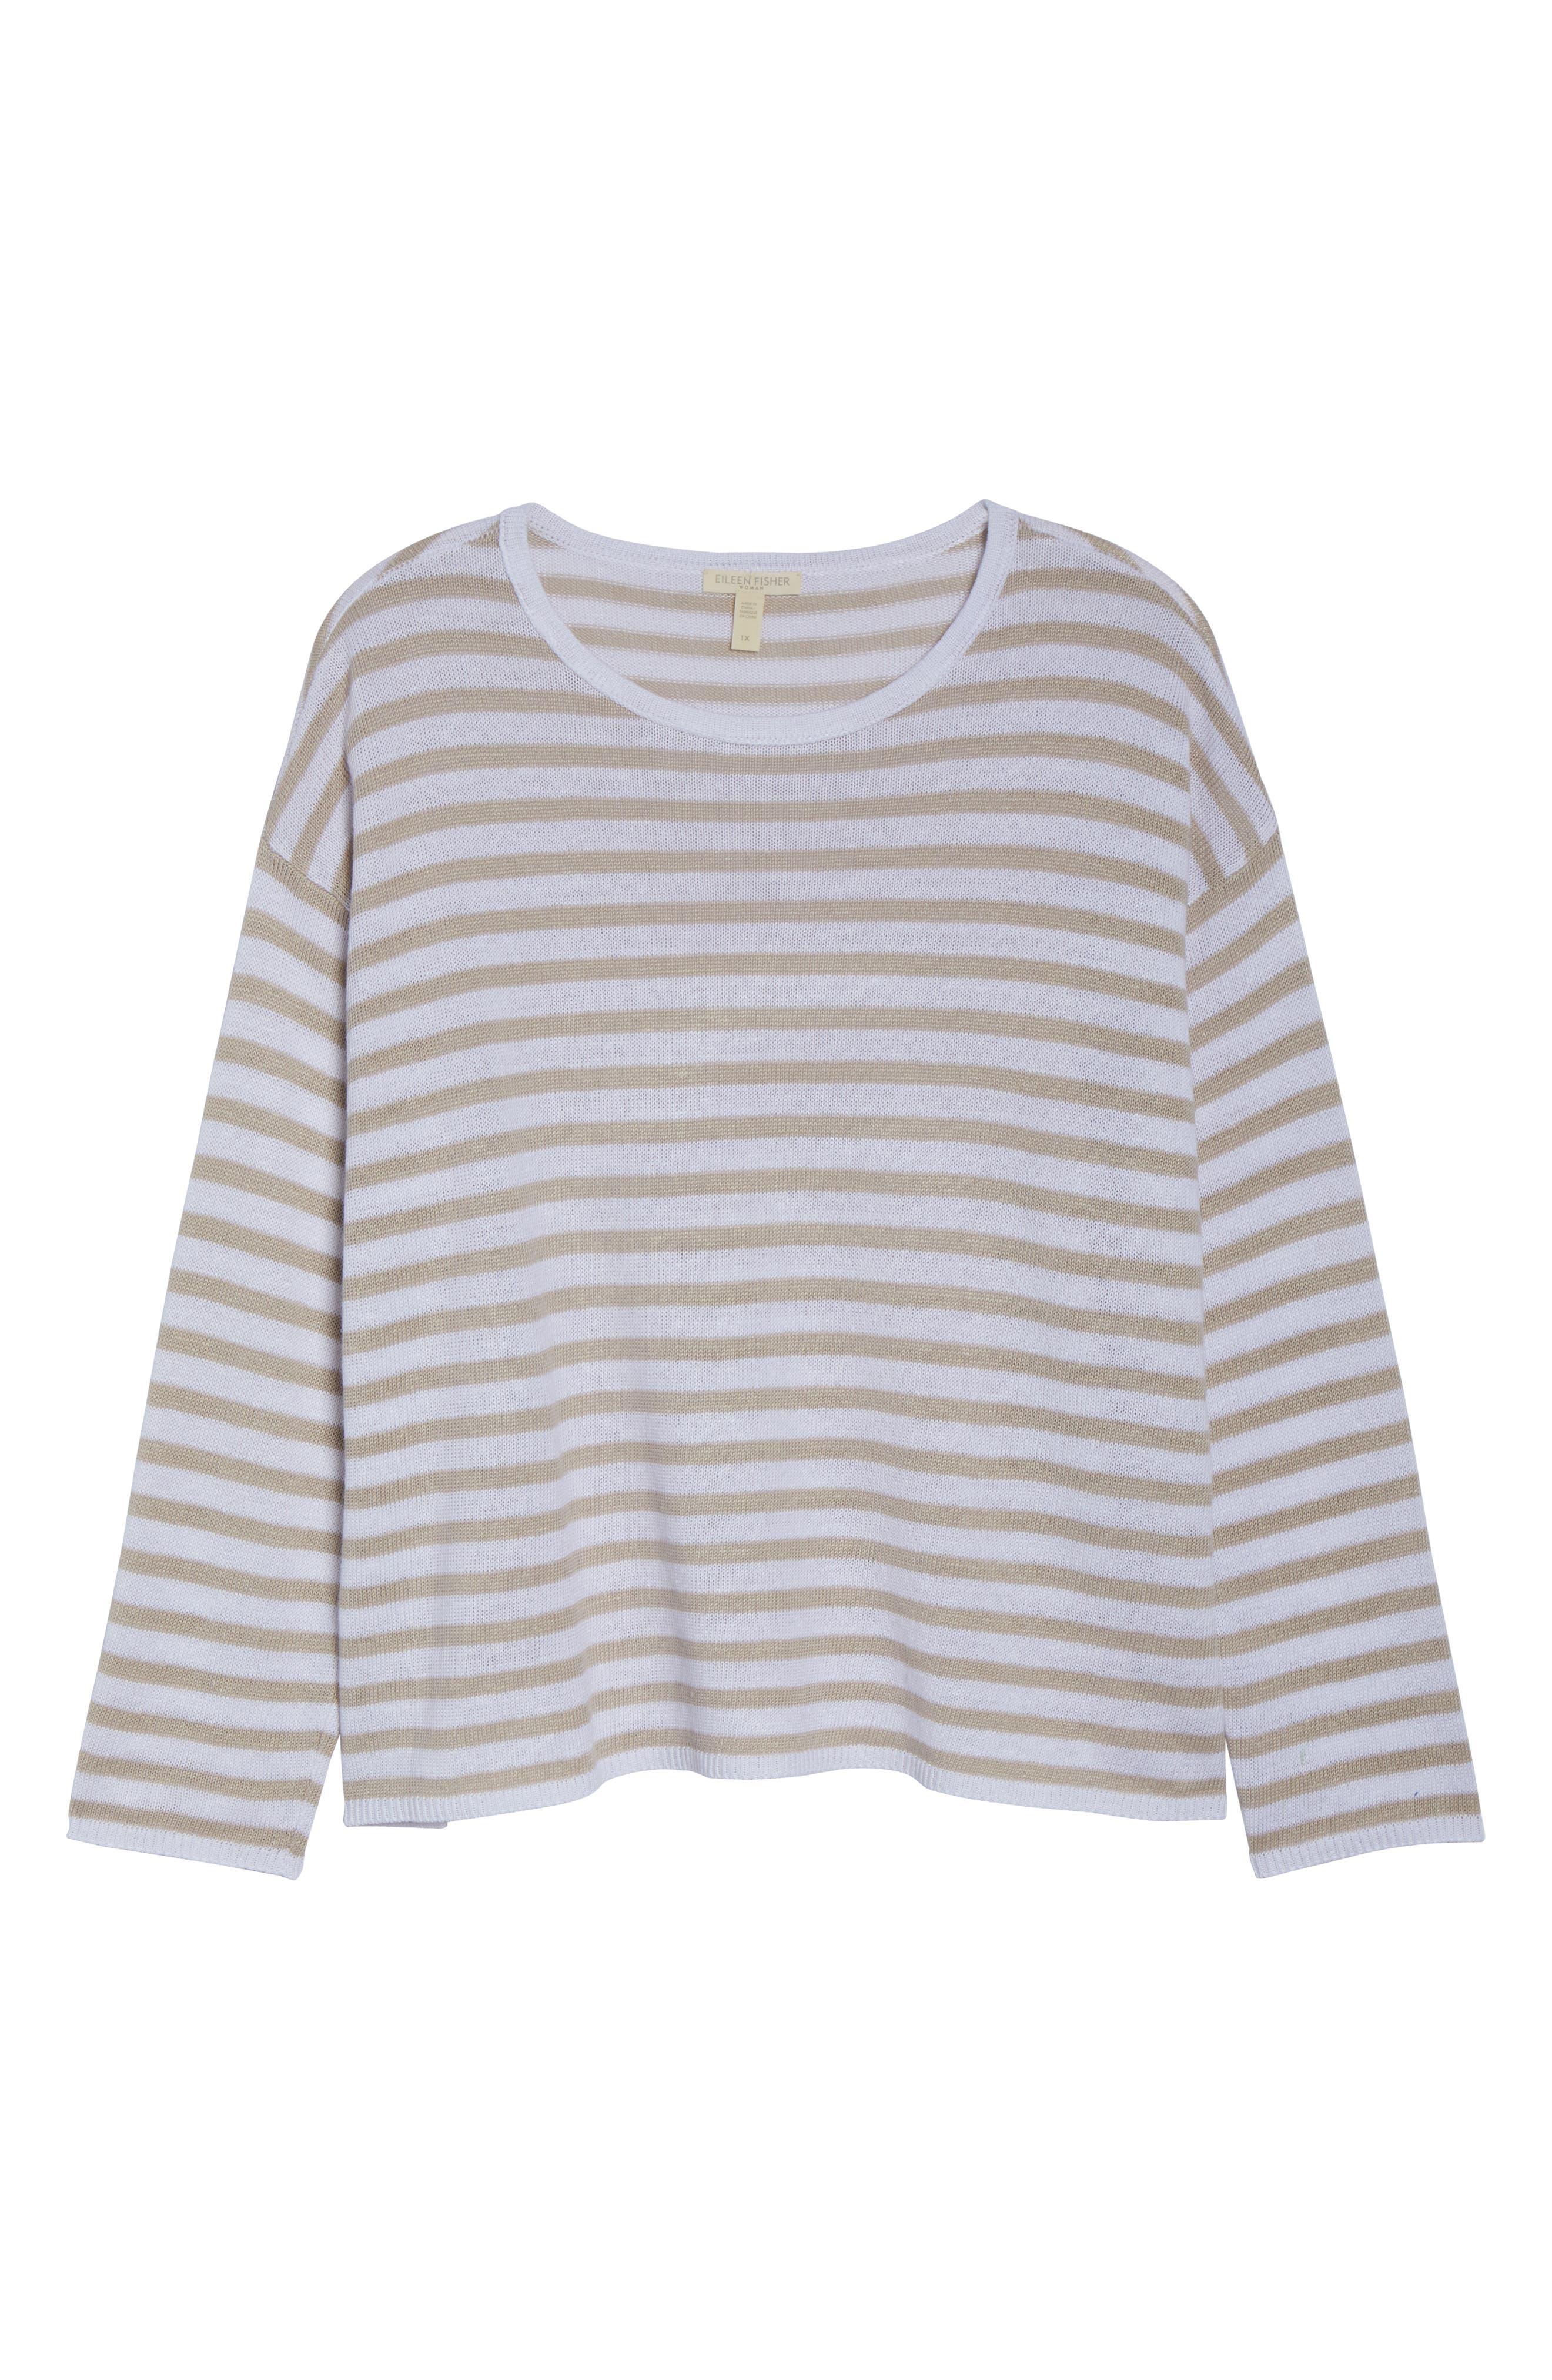 EILEEN FISHER, Stripe Organic Linen Sweater, Alternate thumbnail 6, color, WHITE NATURAL